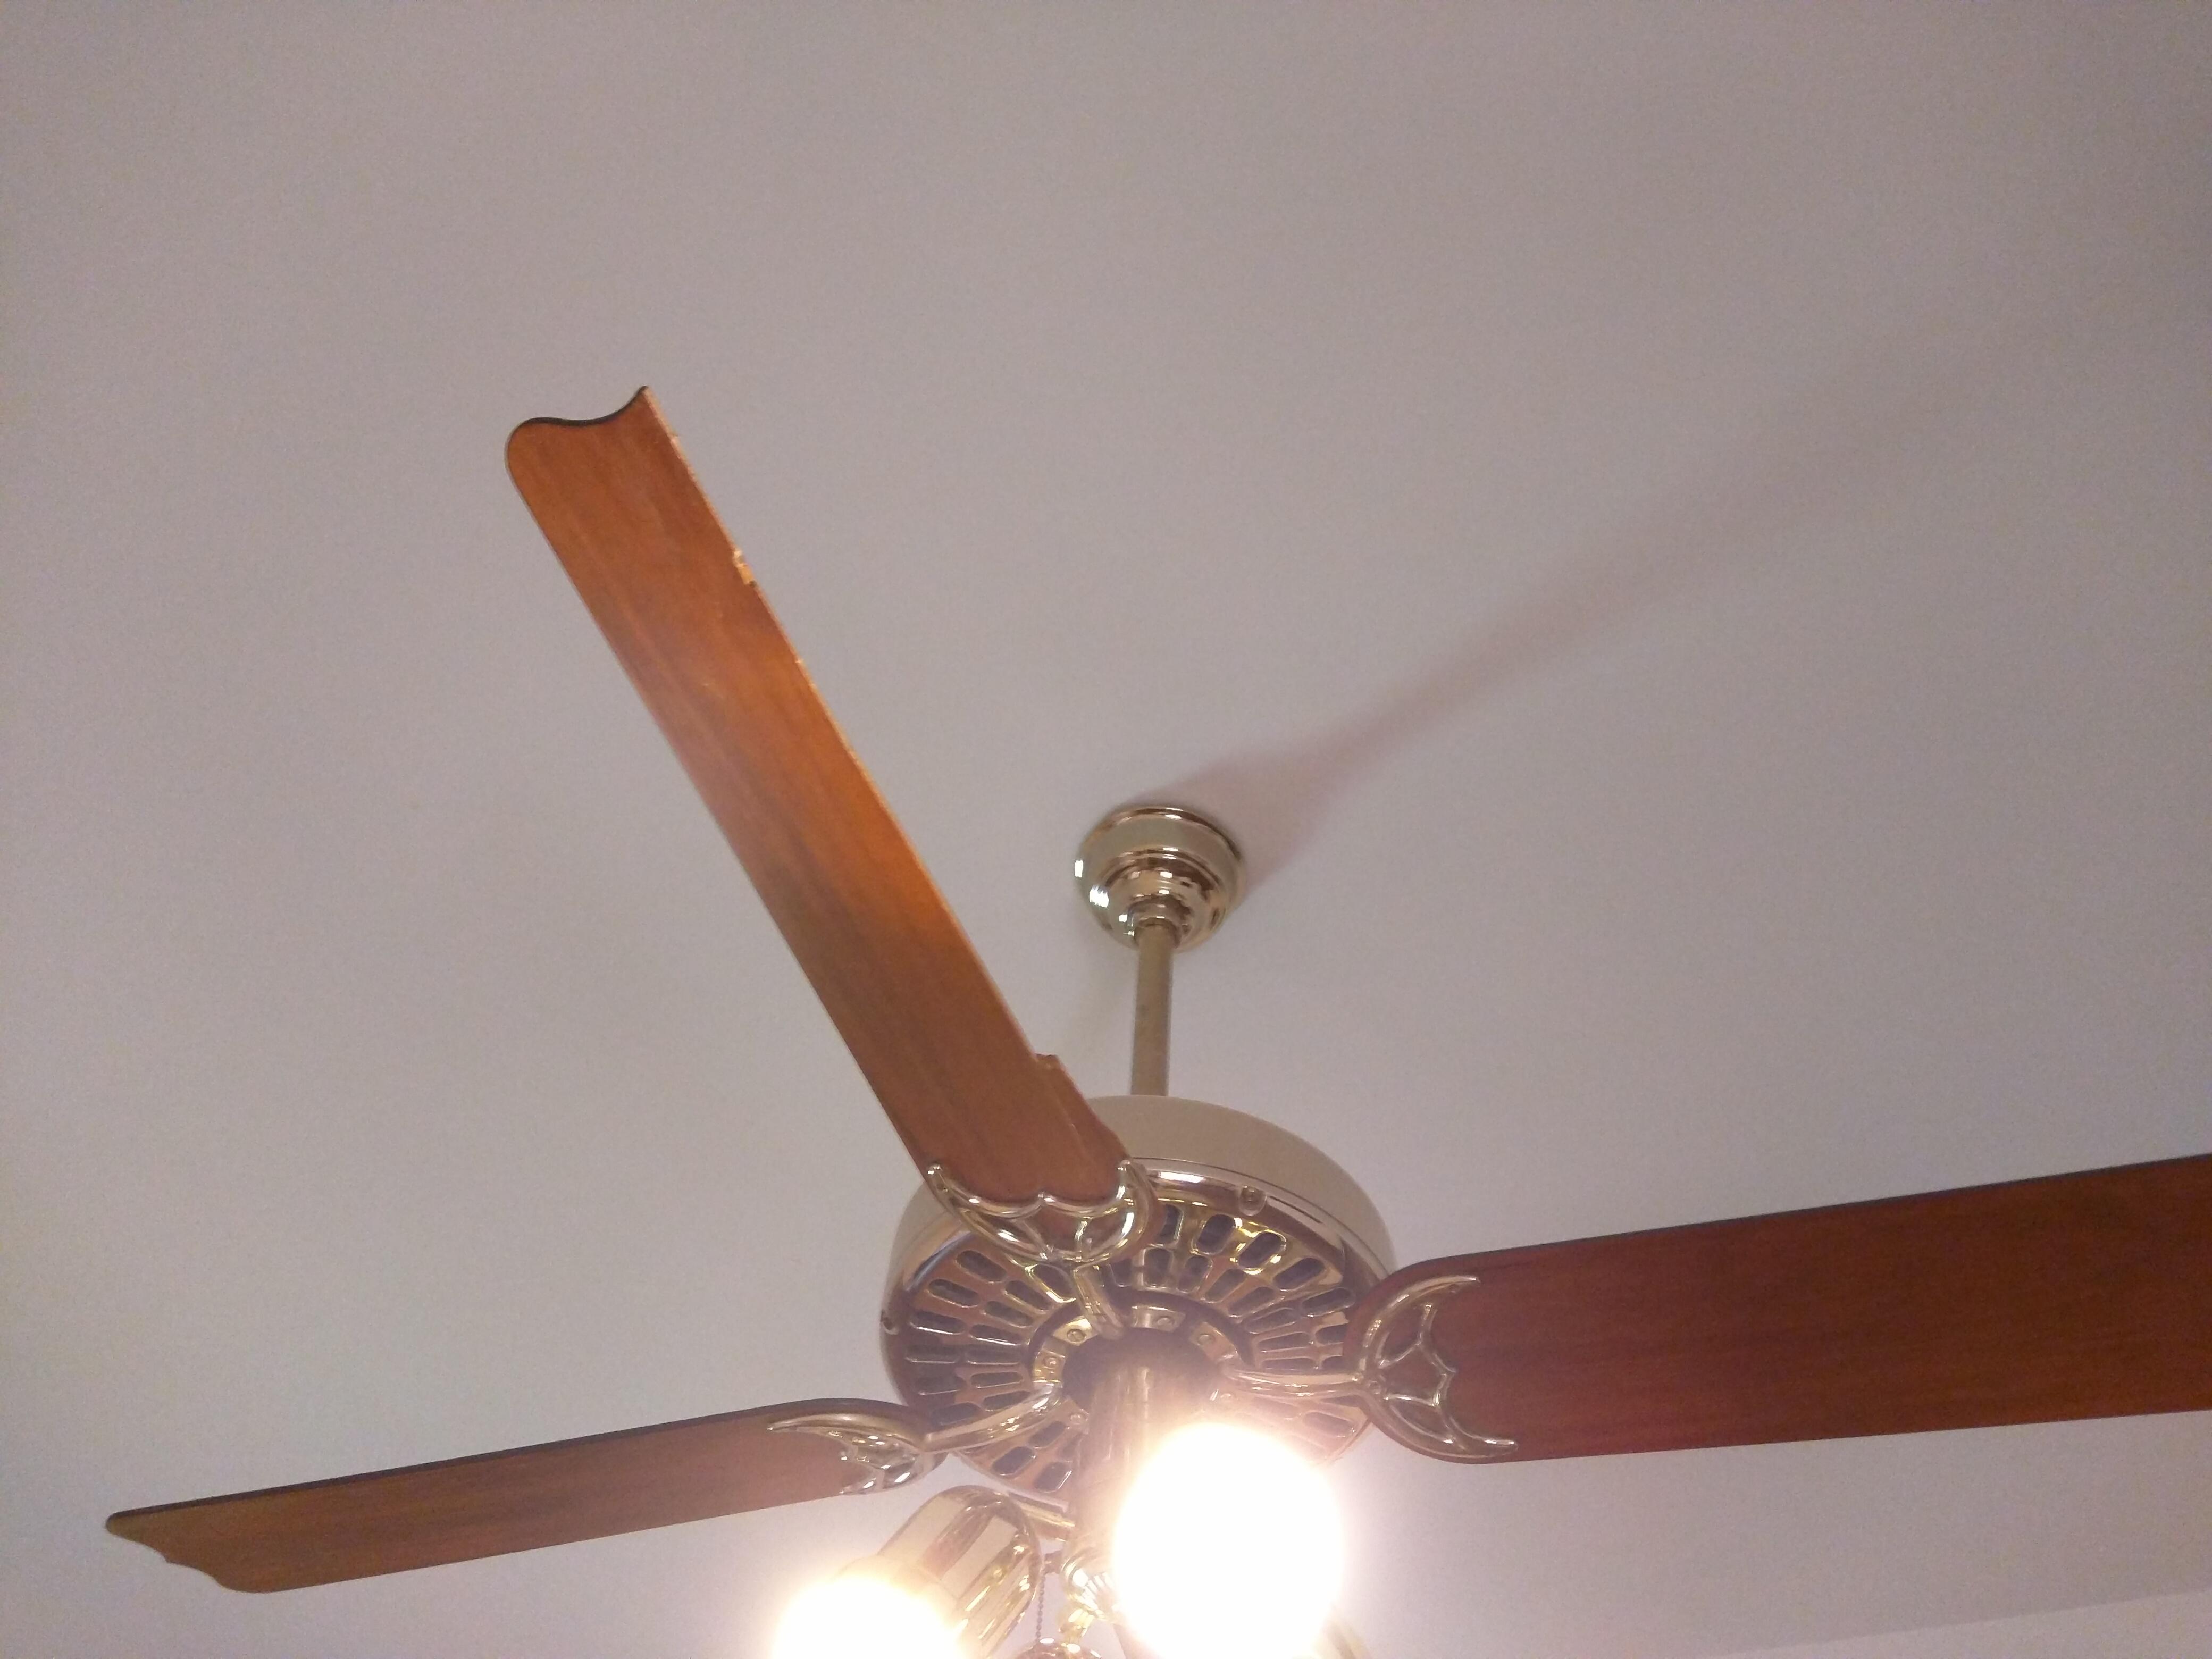 Broken Ceiling Fan : Hardwood flooring archives nightmares